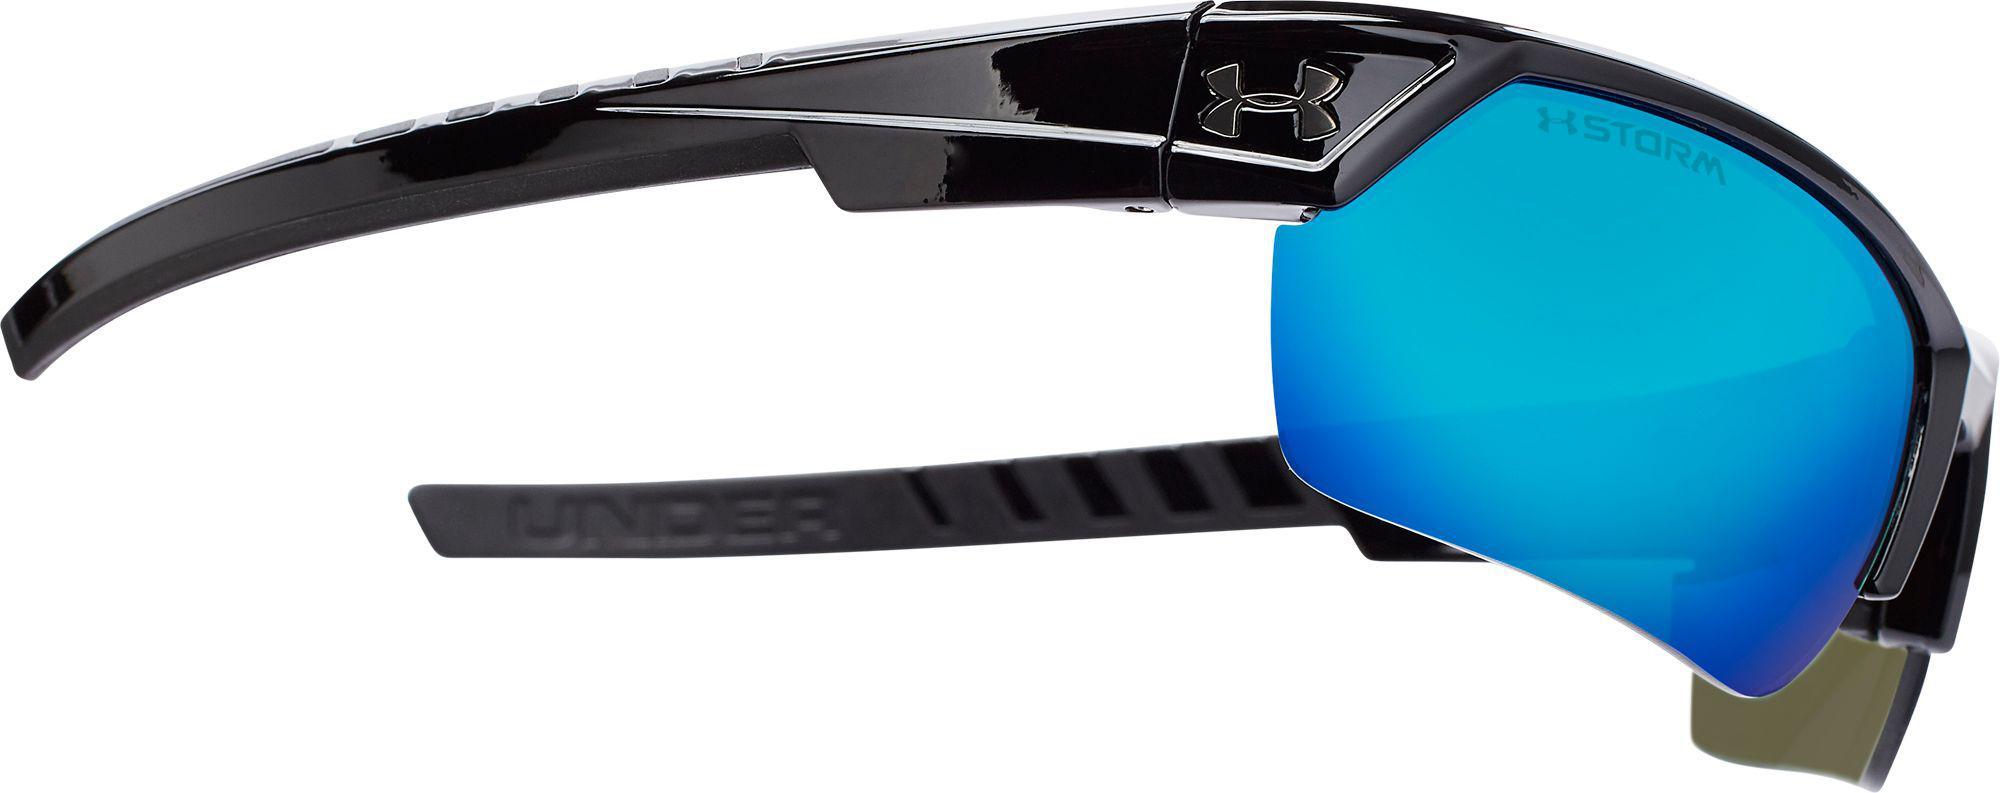 ea3cec06880 Under Armour - Black Igniter 2.0 Storm Polarized Sunglasses for Men - Lyst